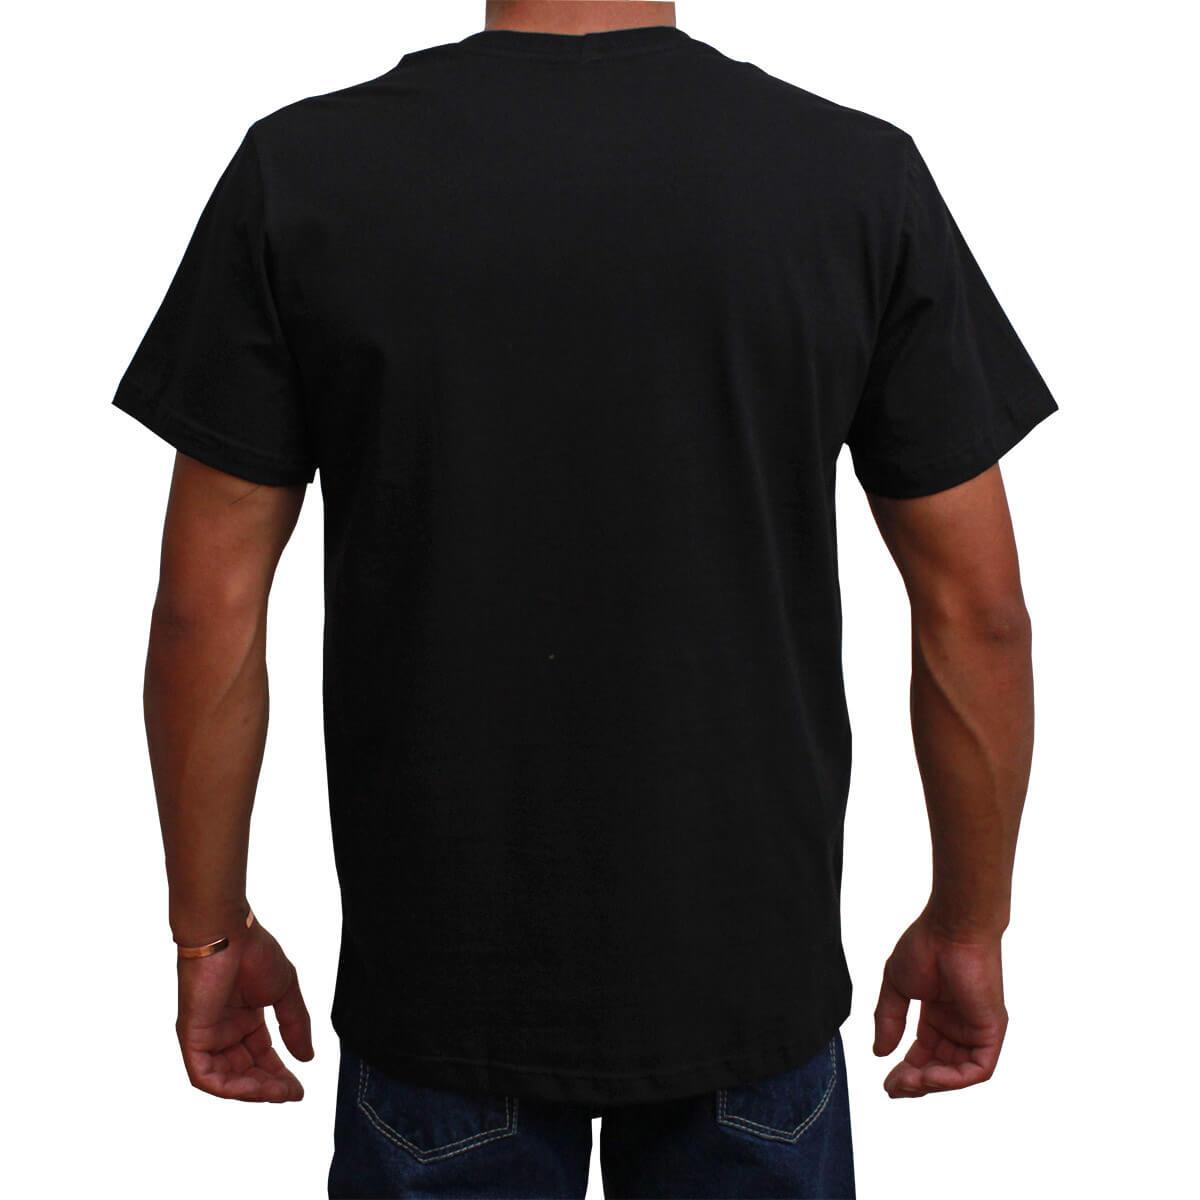 Camiseta Indian Farm Masculina Preta Original